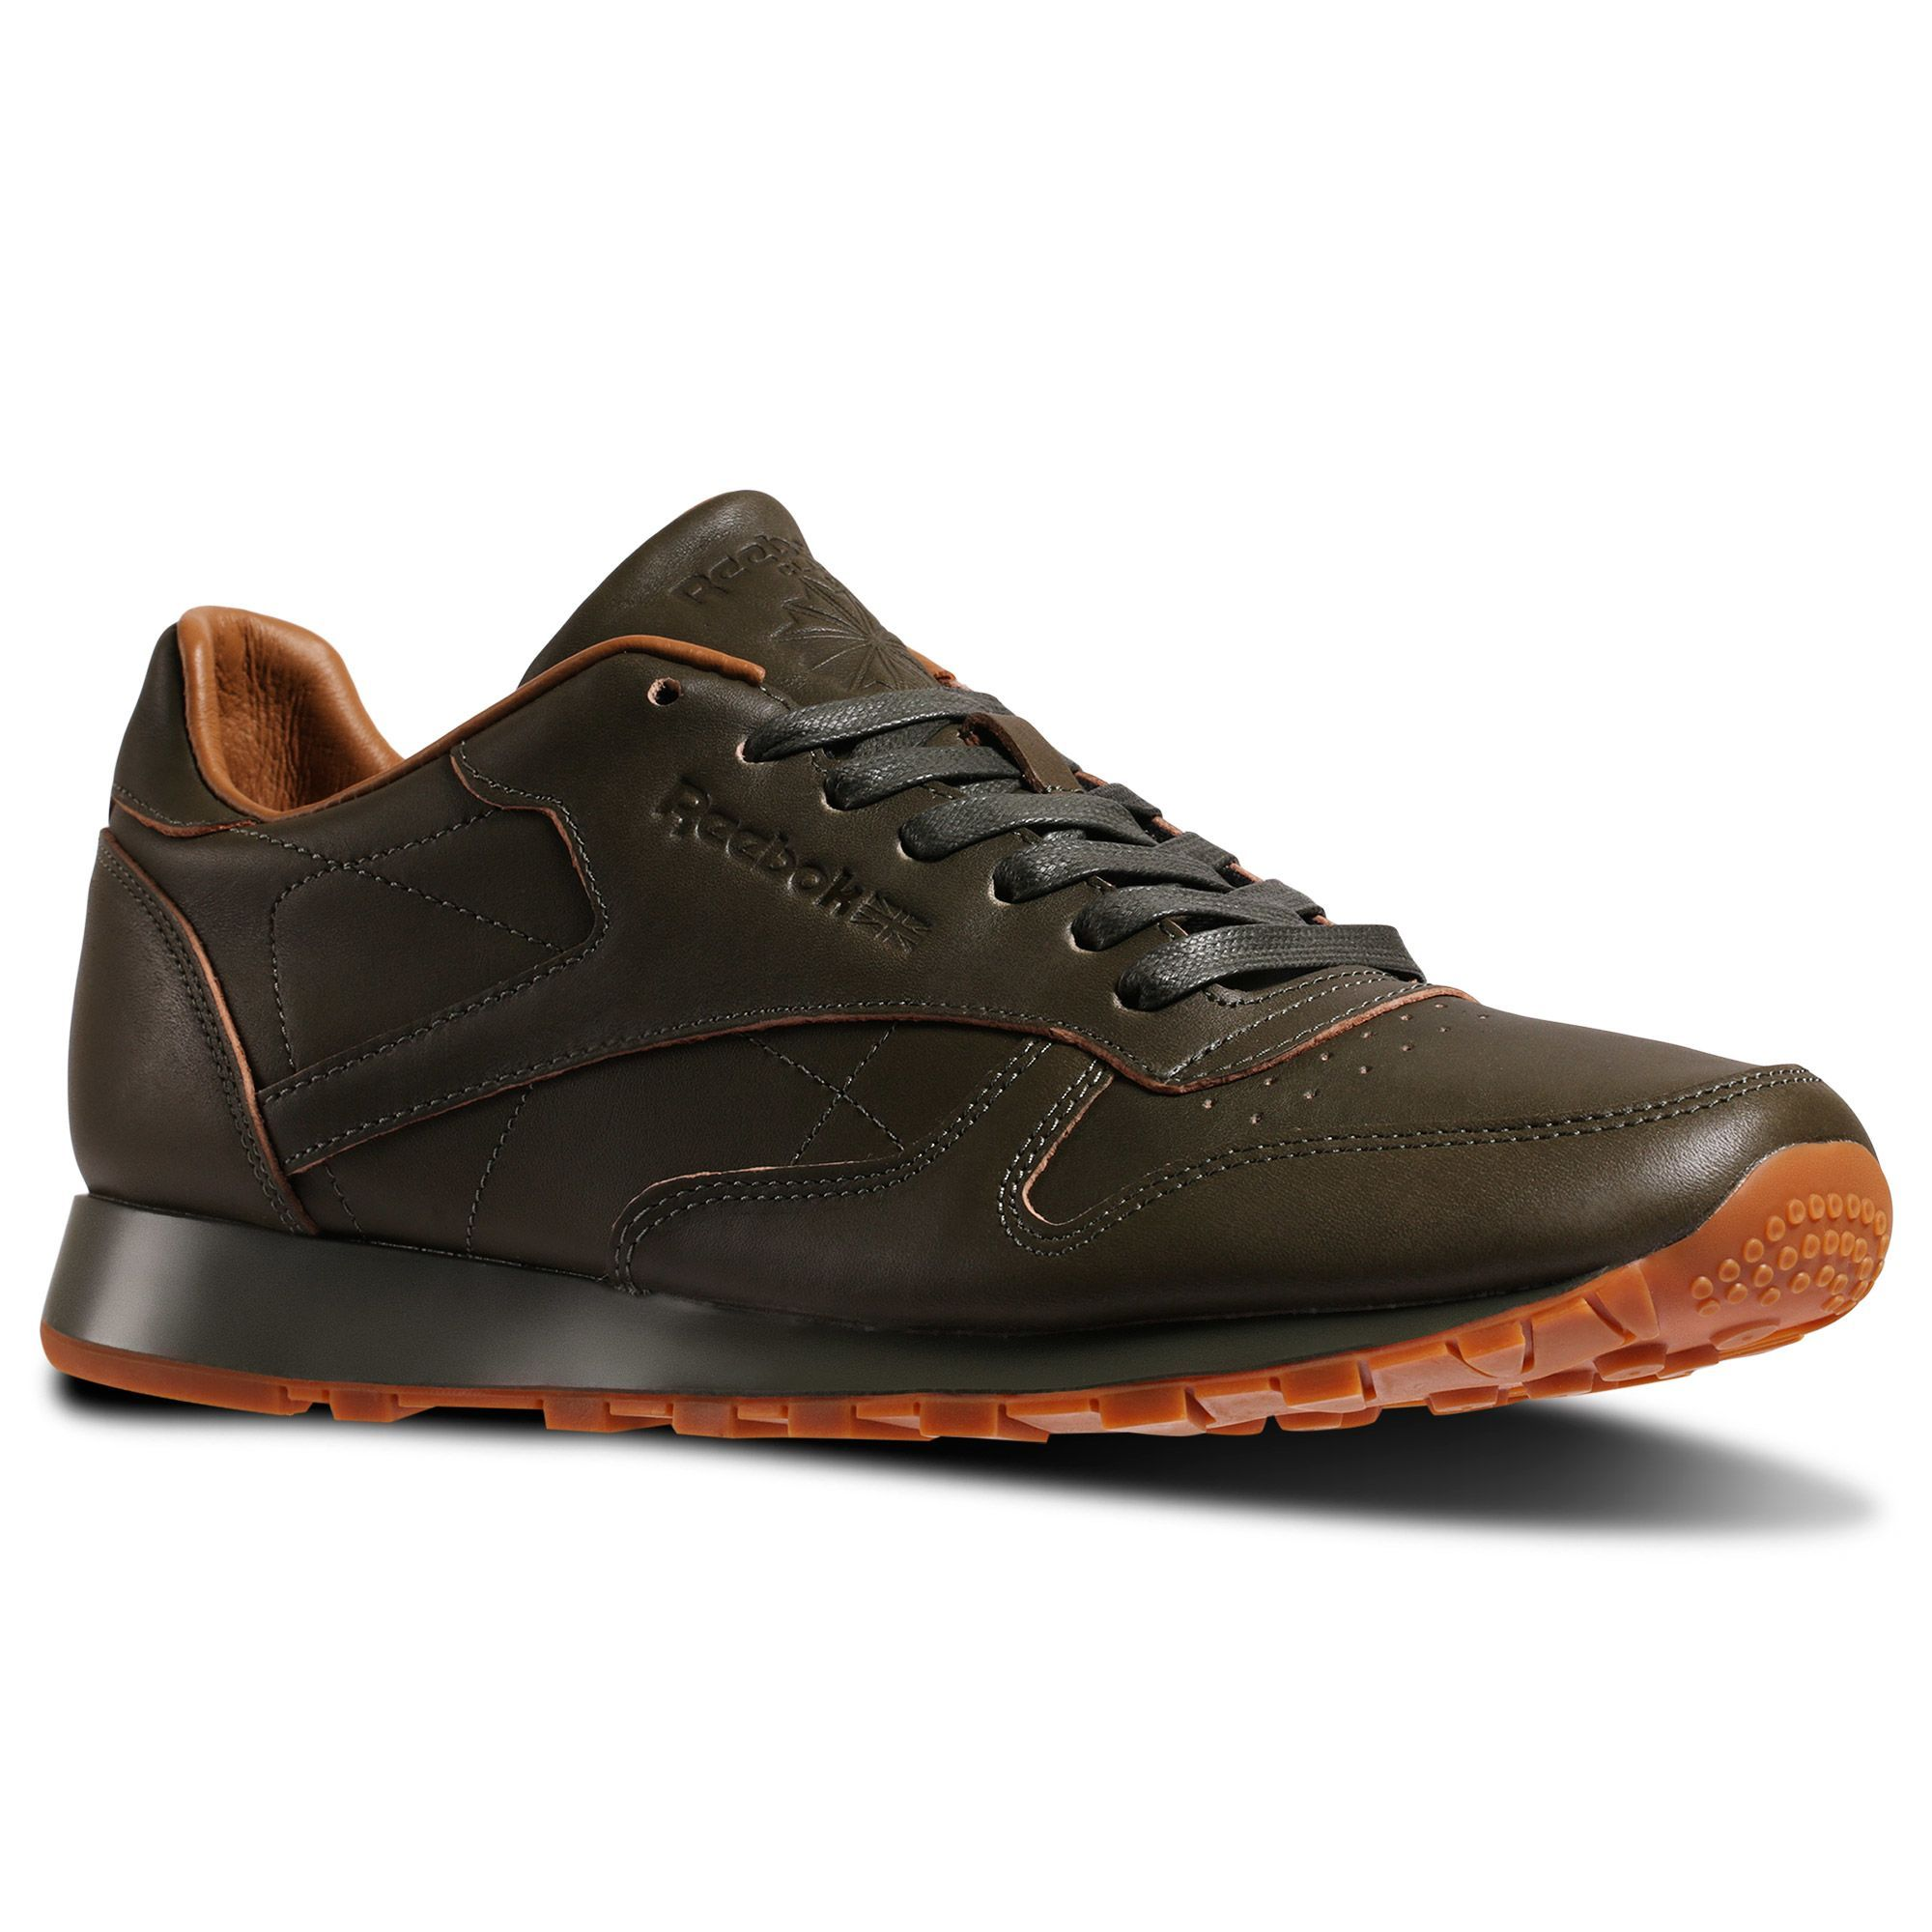 Tenis Reebok x Kendrick Lamar Classic Leather Lux | shoes en